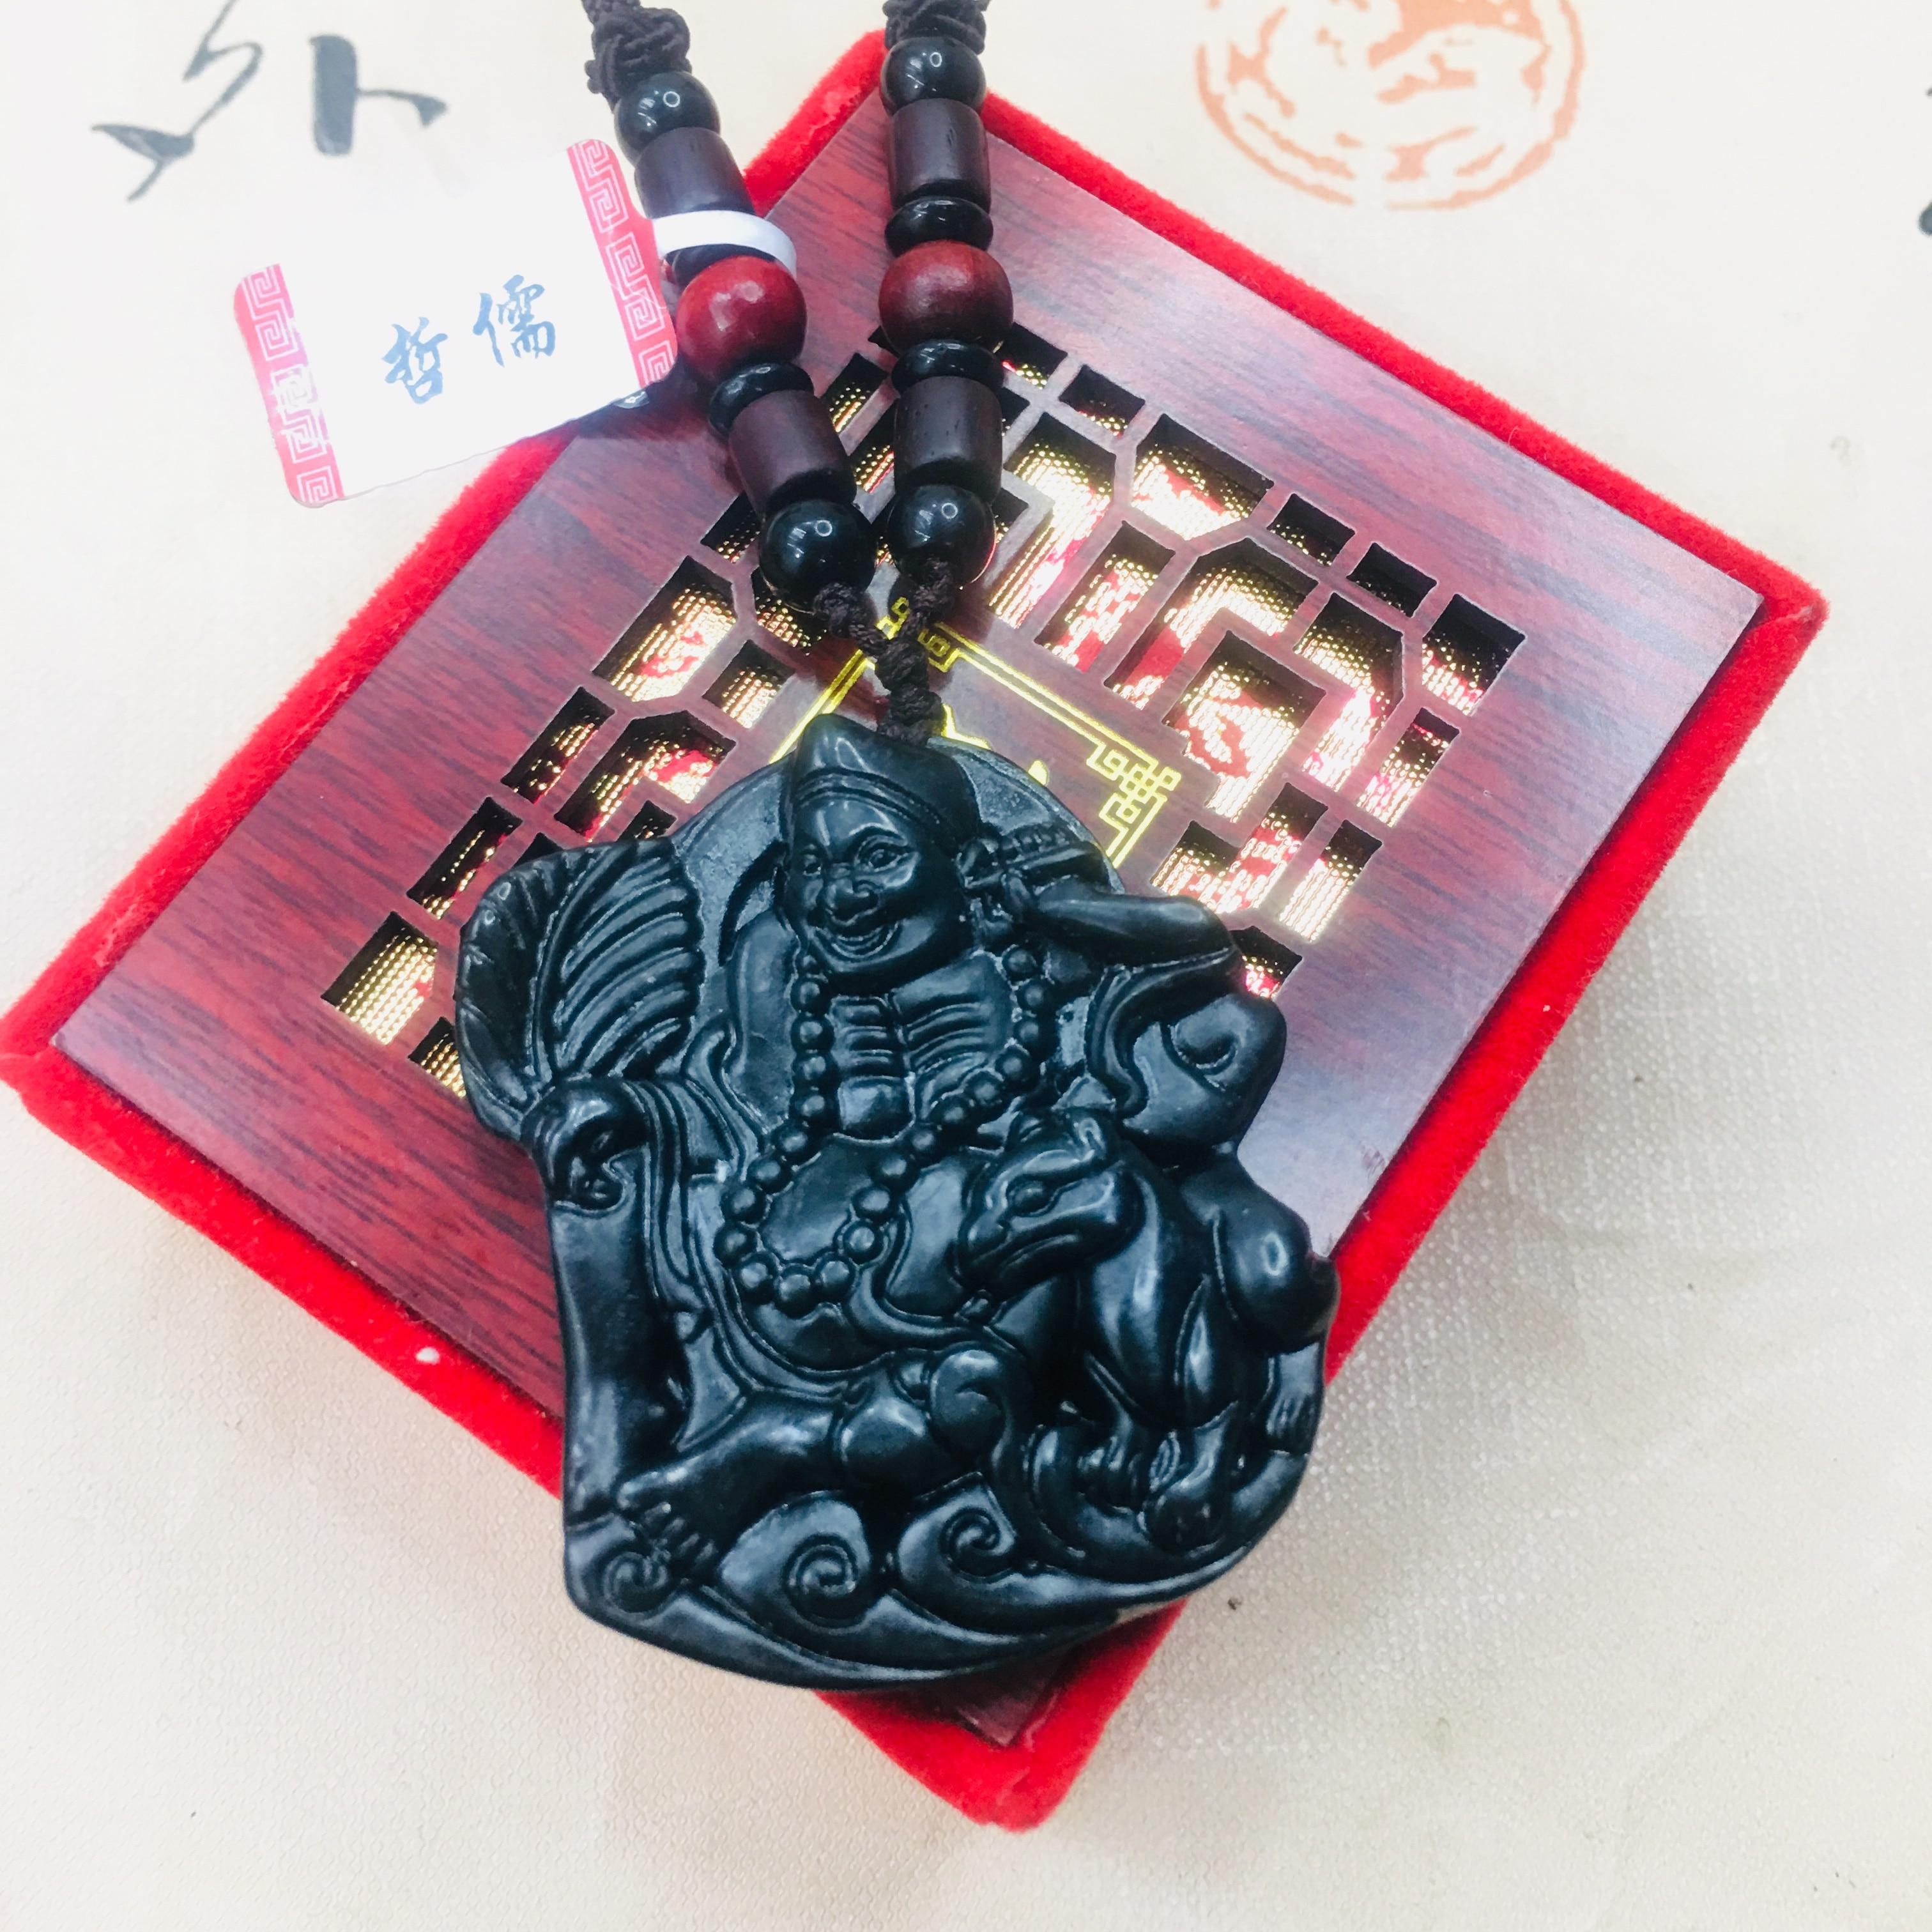 Zheru Natural And Tian Moyu Carved Living Buddha Jigong Pendant With Wooden Bead Necklace Beautiful Men And Women Sweater Chain